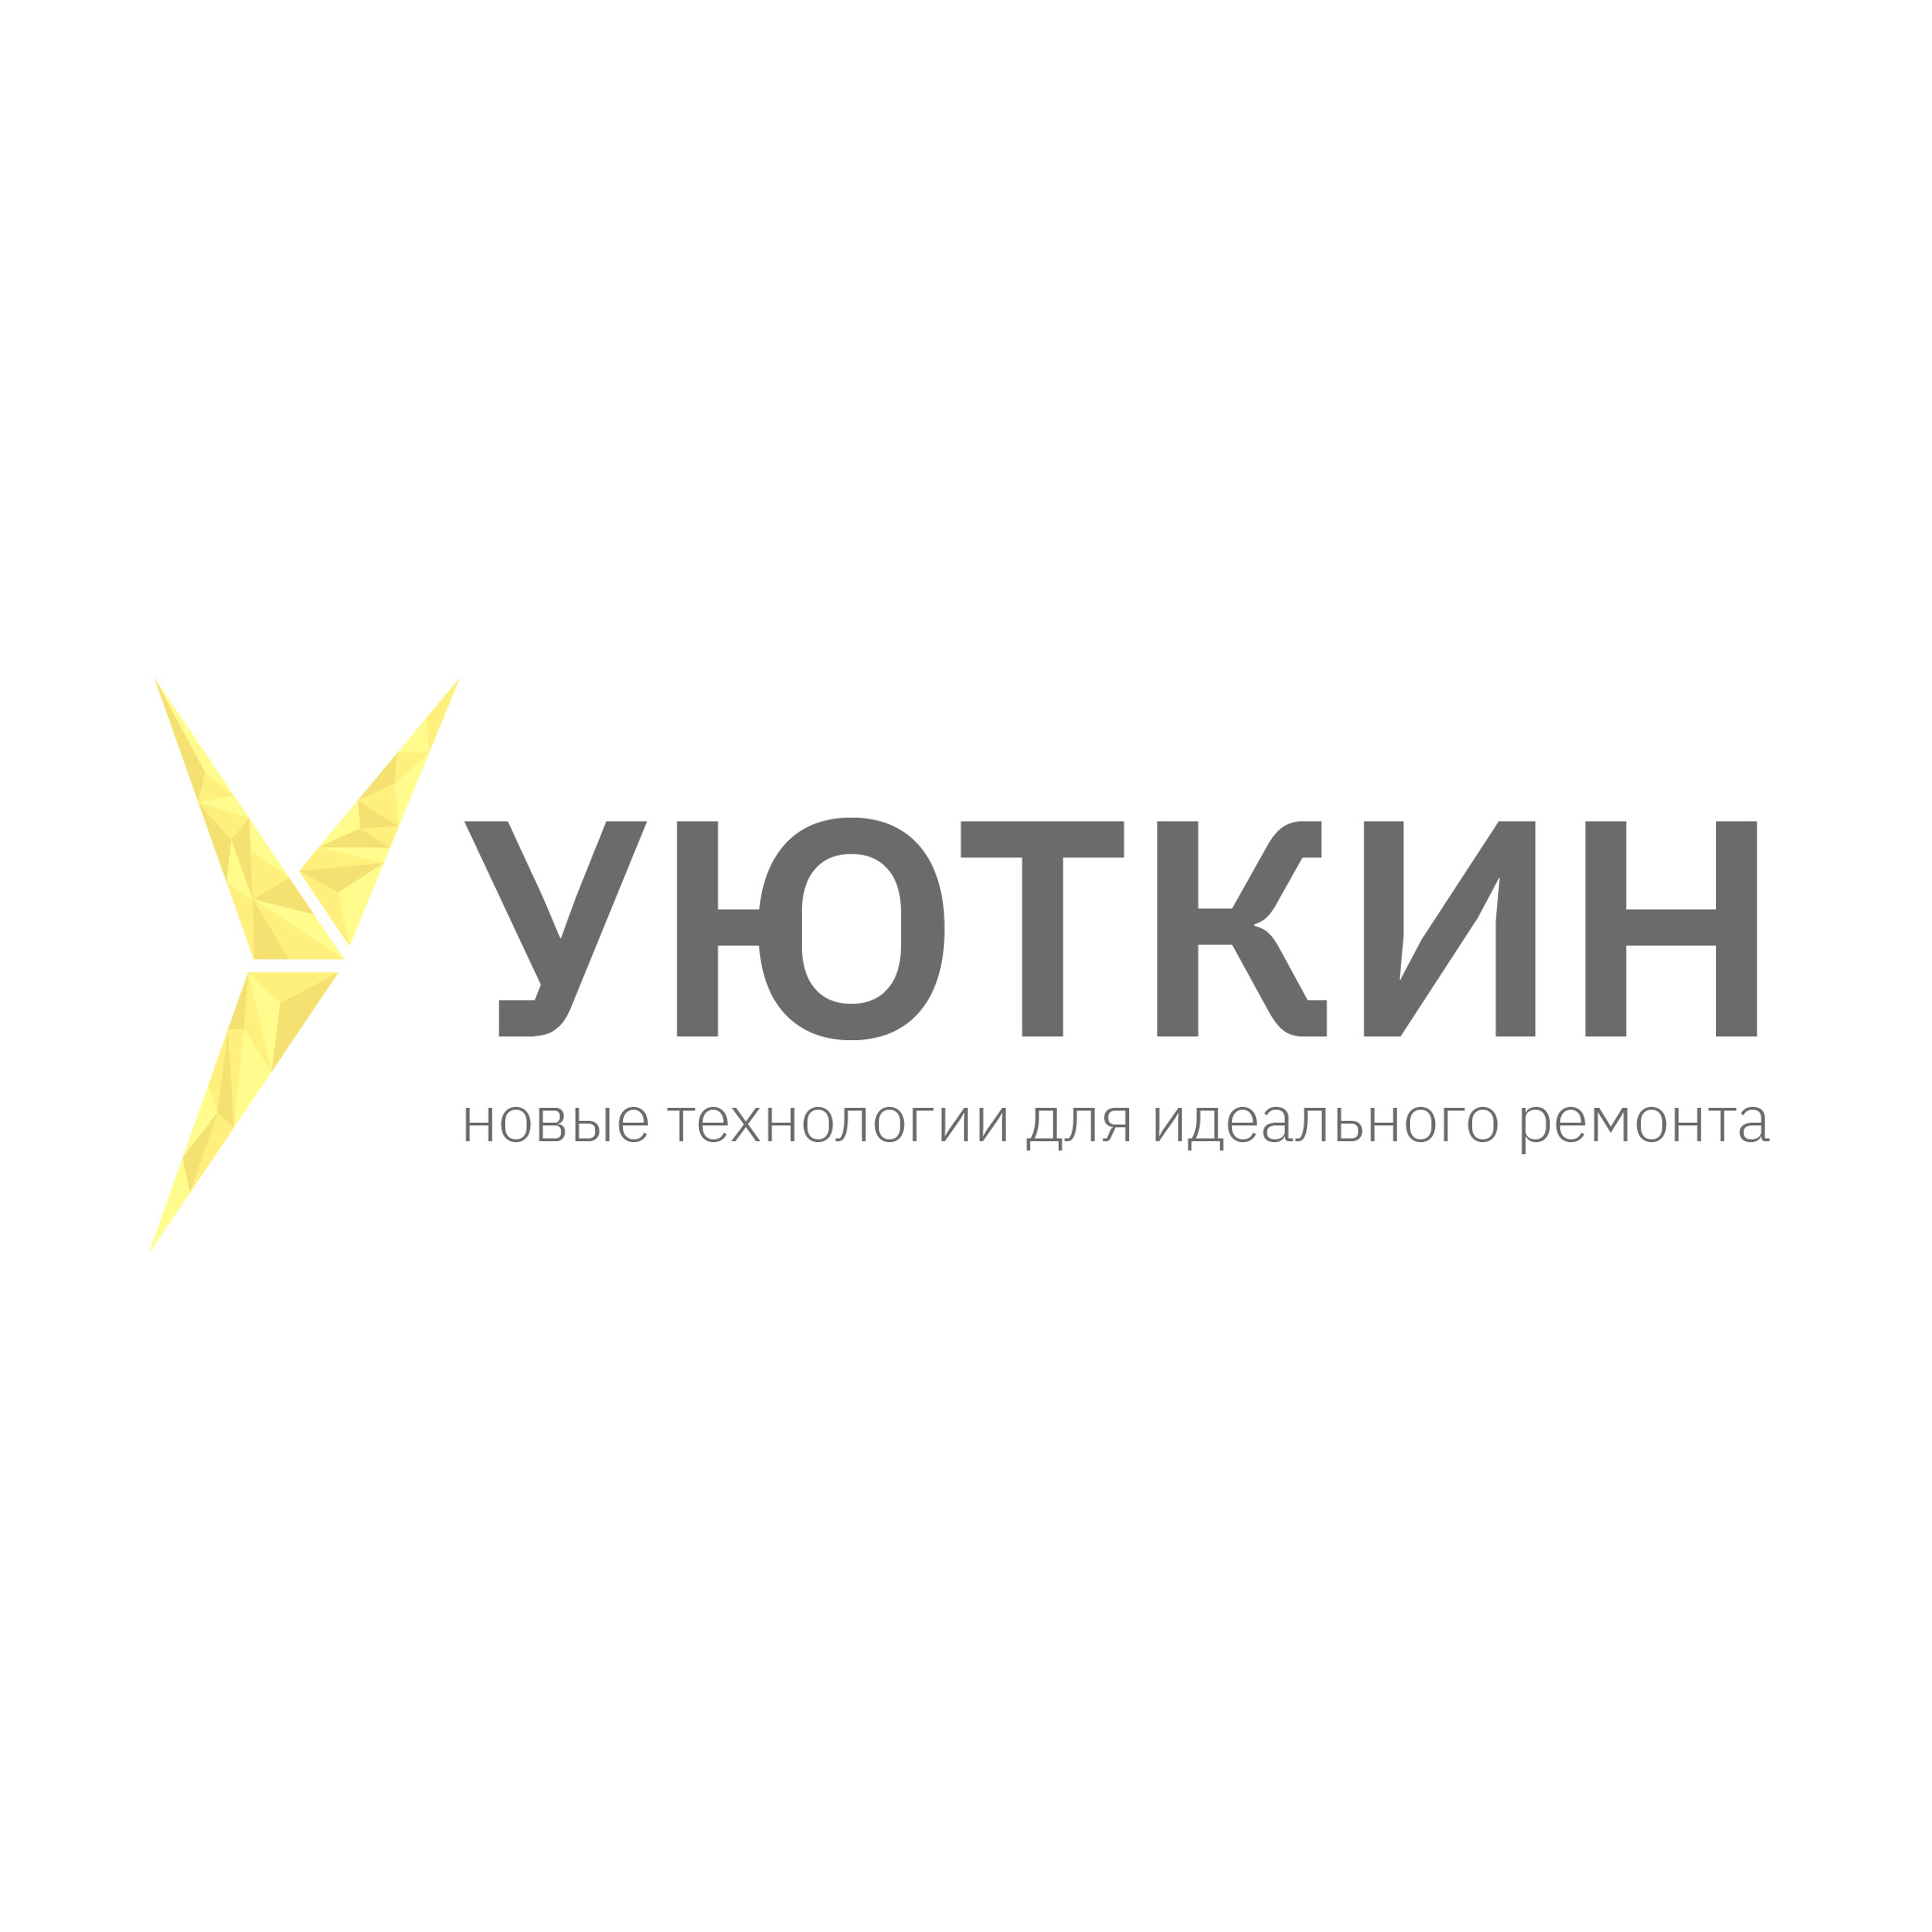 Создание логотипа и стиля сайта фото f_0095c62fb61608c9.jpg